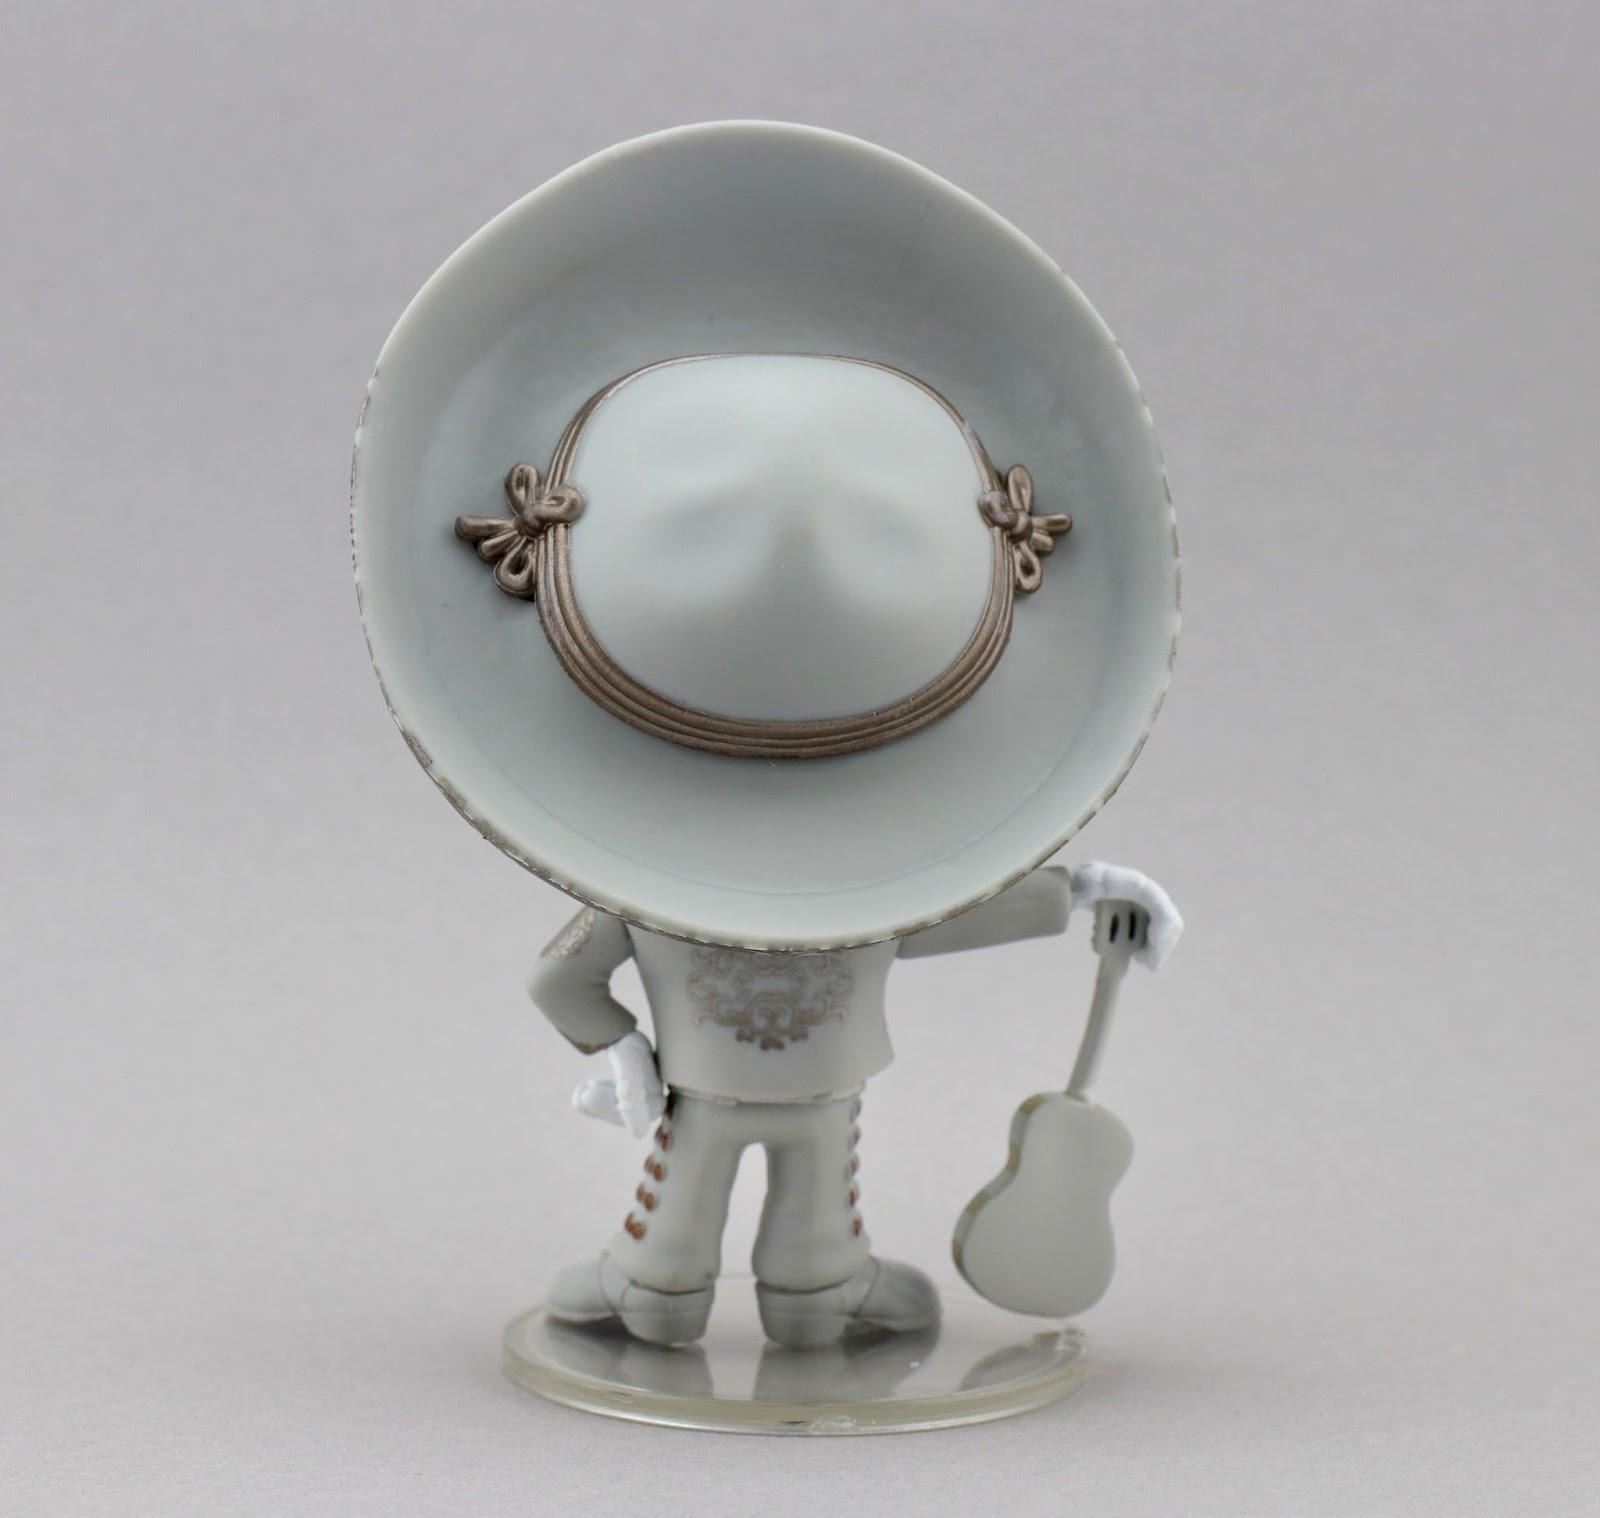 pixar coco funko pop ernesto